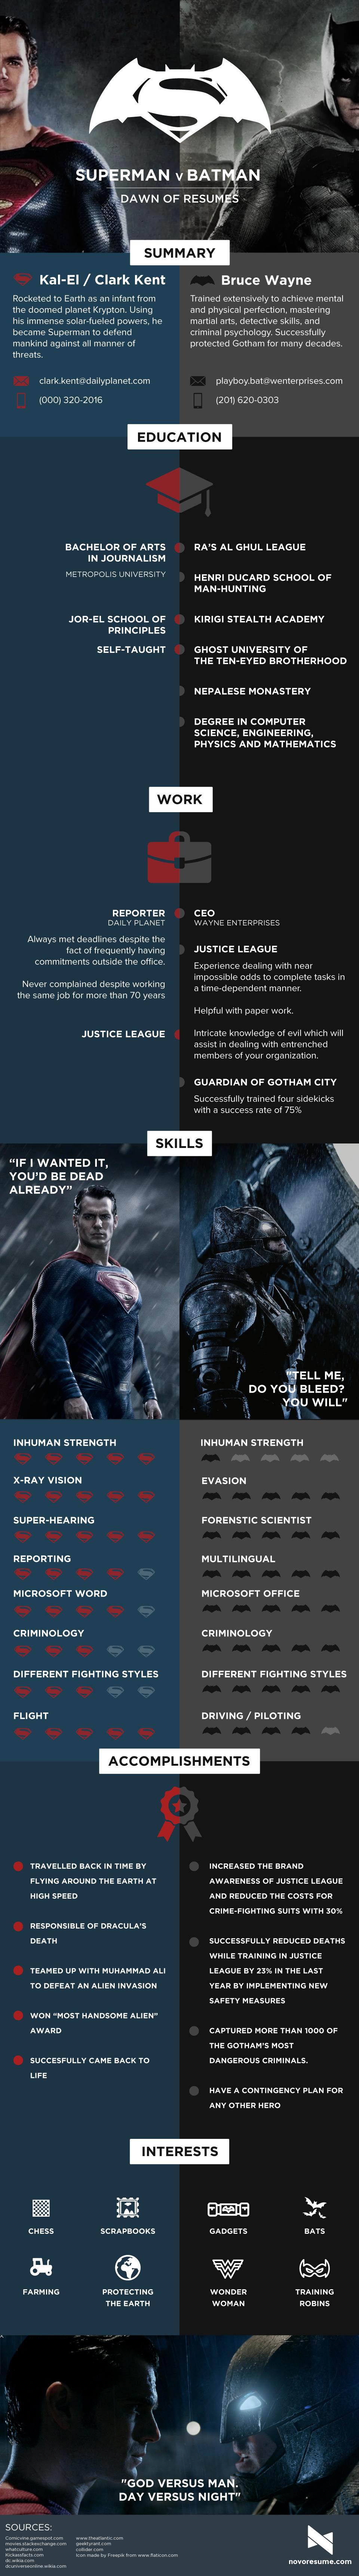 these are the unbeatable superhero resumes of batman v superman